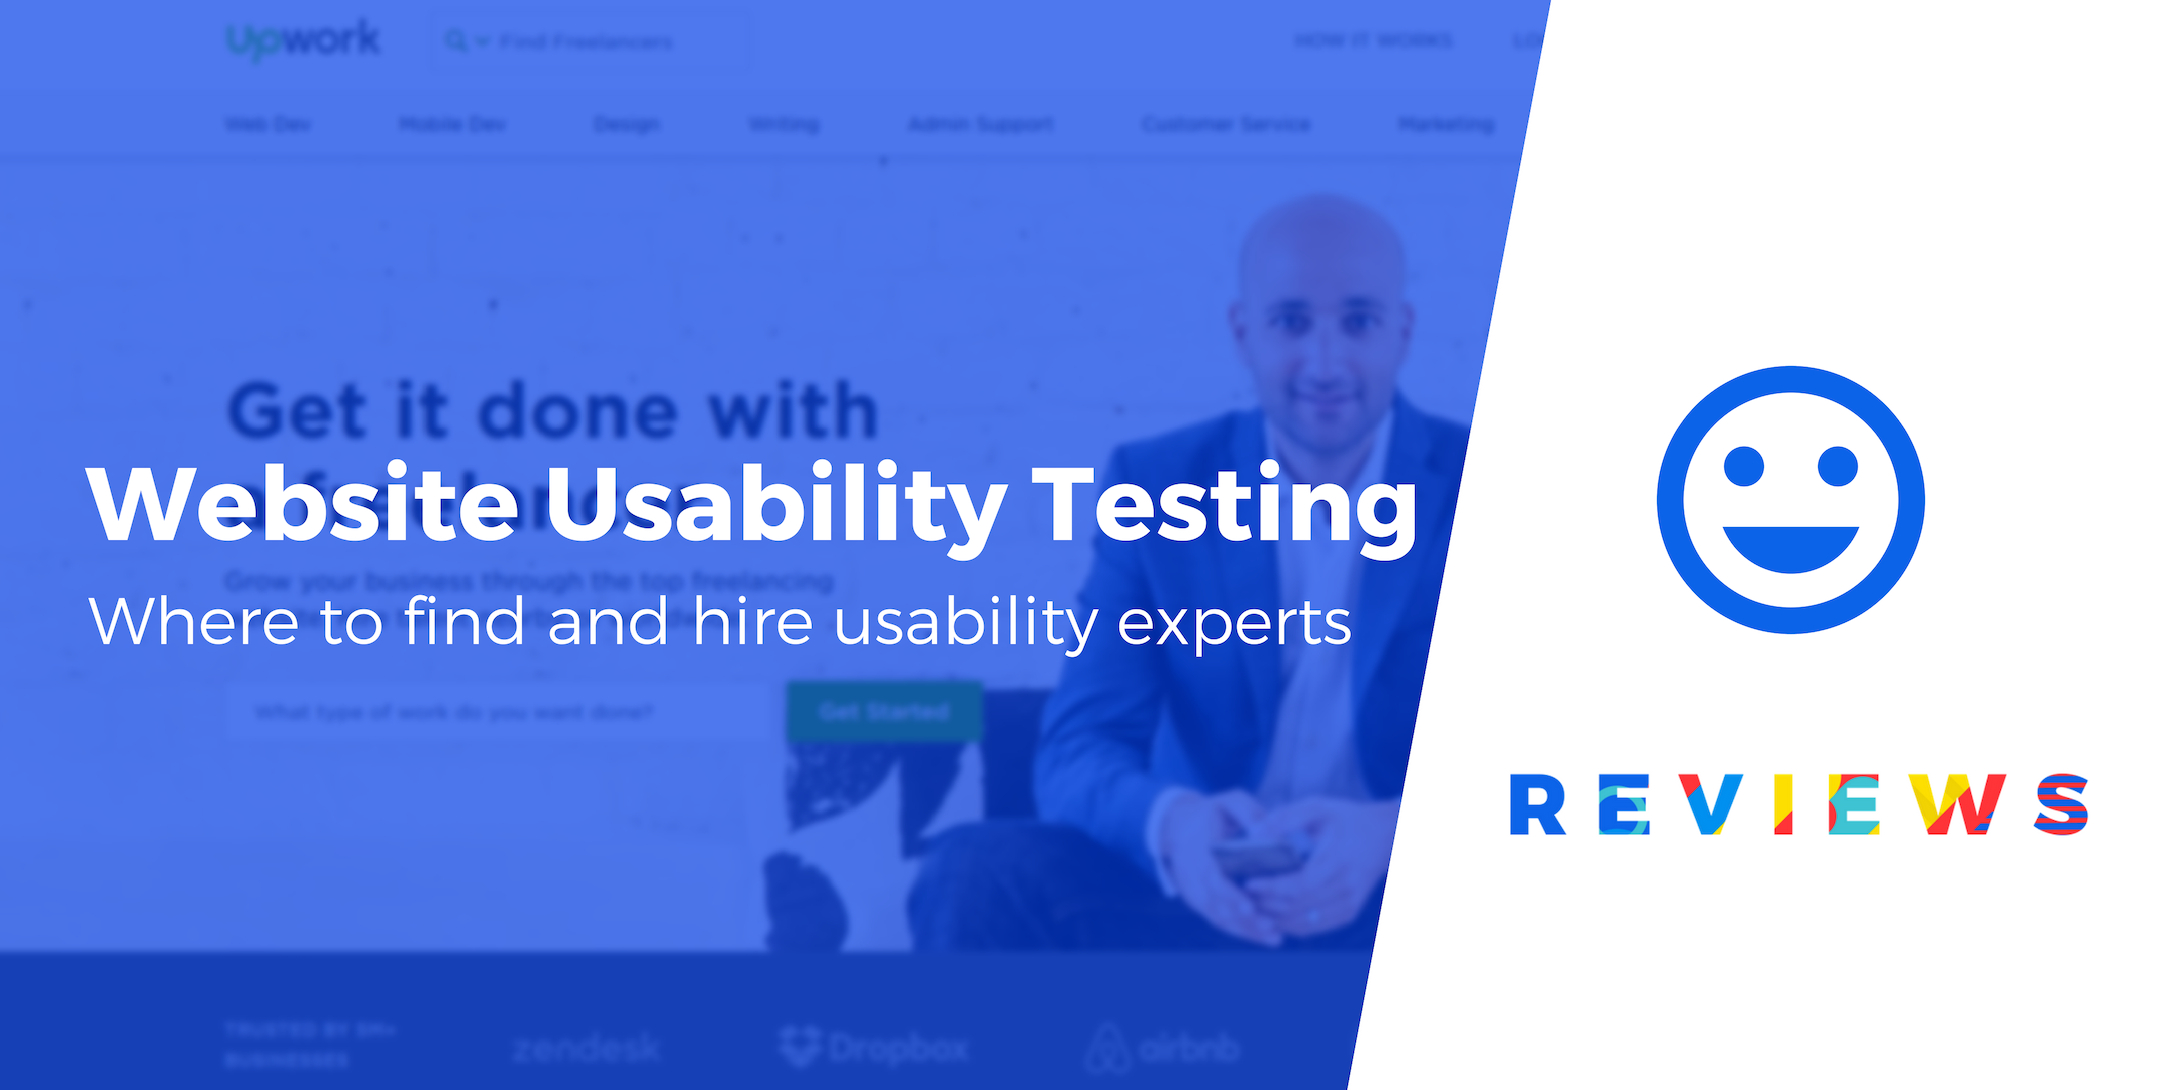 Website Usability Testing